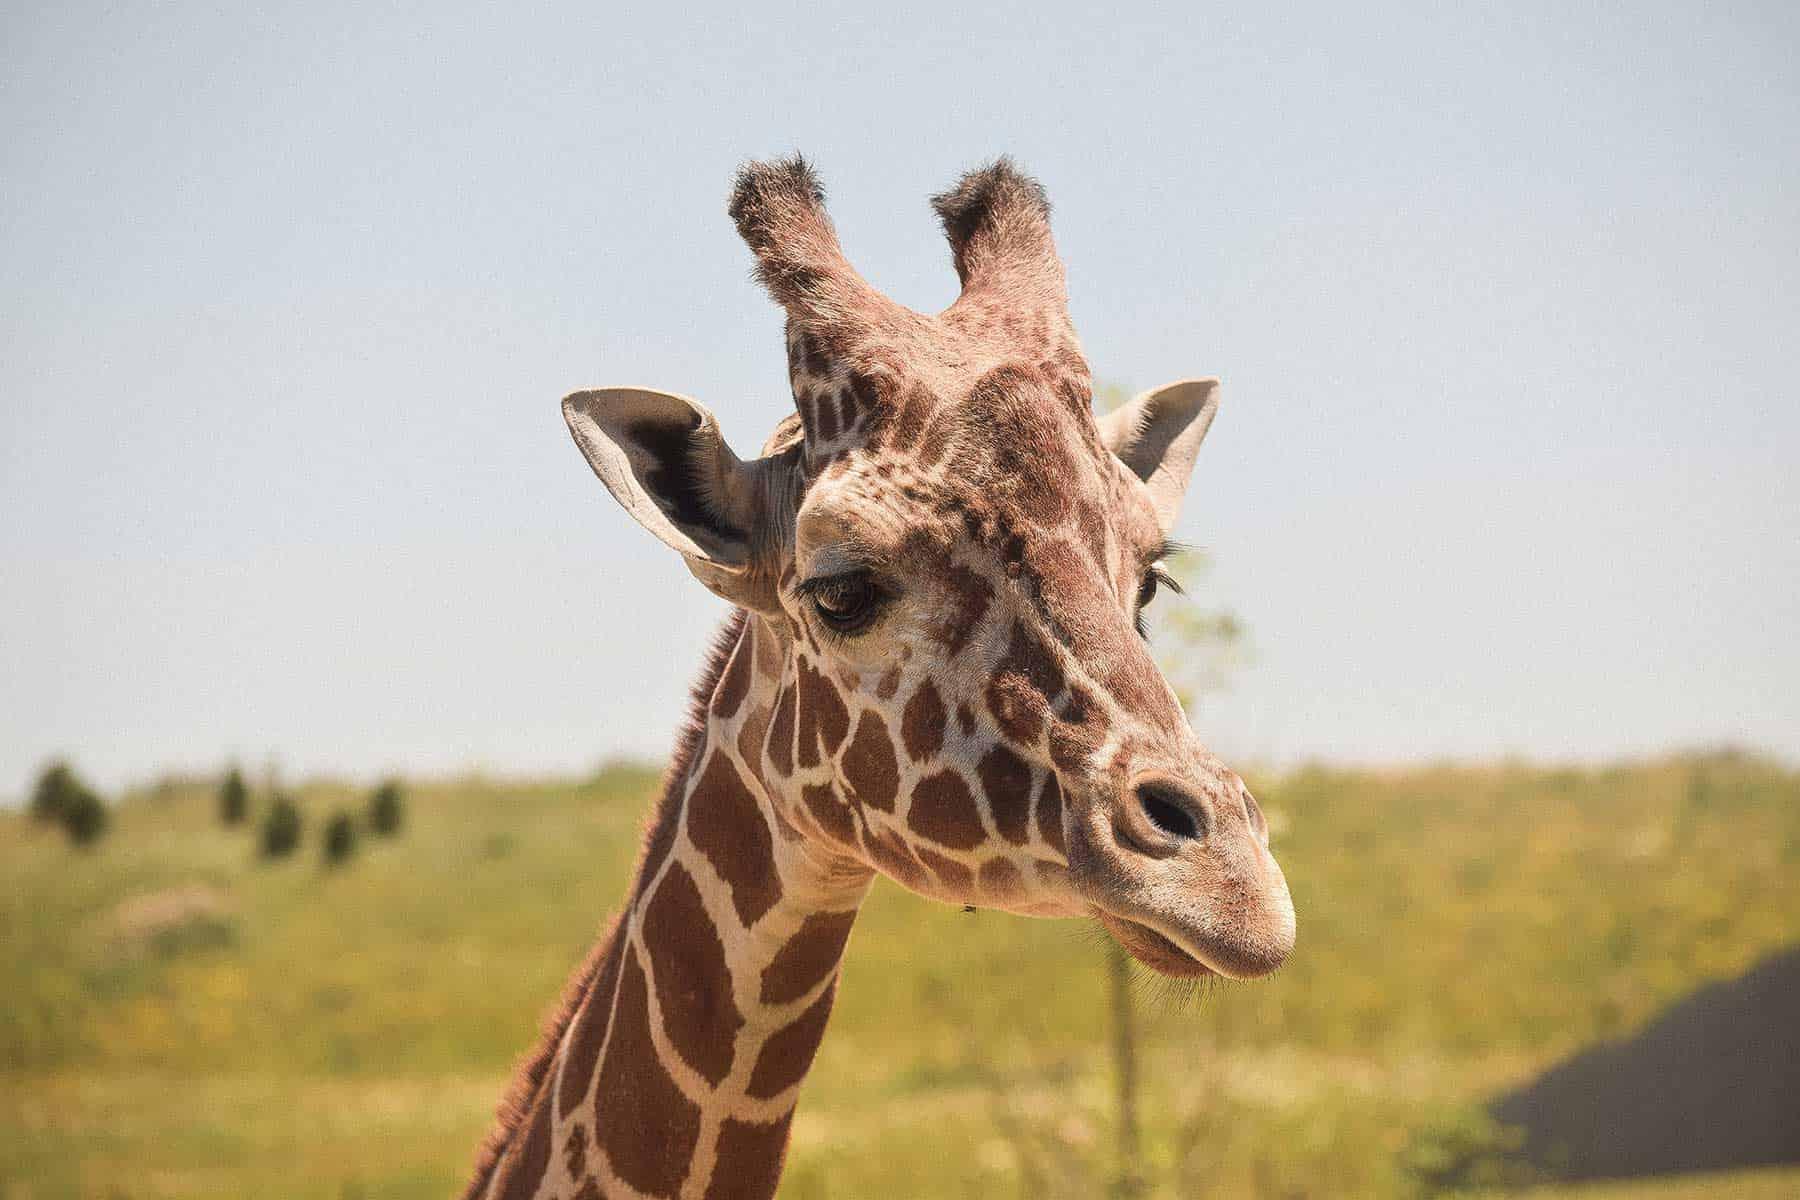 Safariresor_Zambia_giraffe_Nygren_Lind_Resebyrå